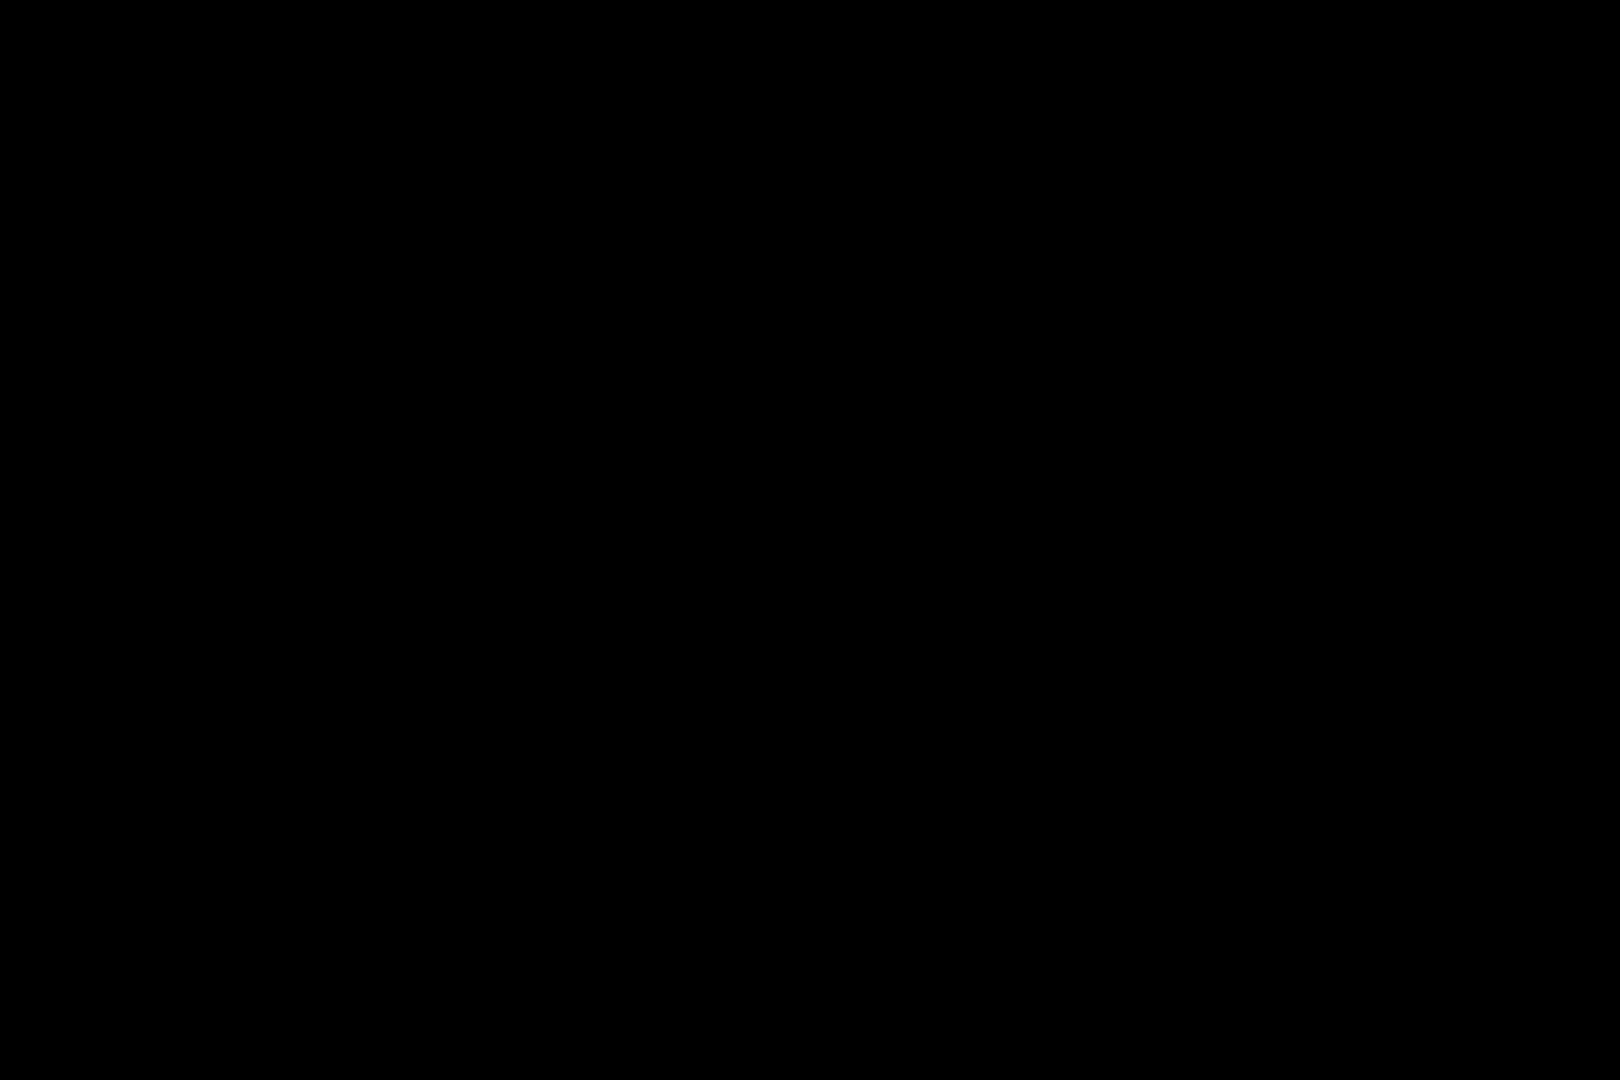 Aquaな露天風呂Vol.480 盗撮シリーズ | 露天風呂編  102PIX 19